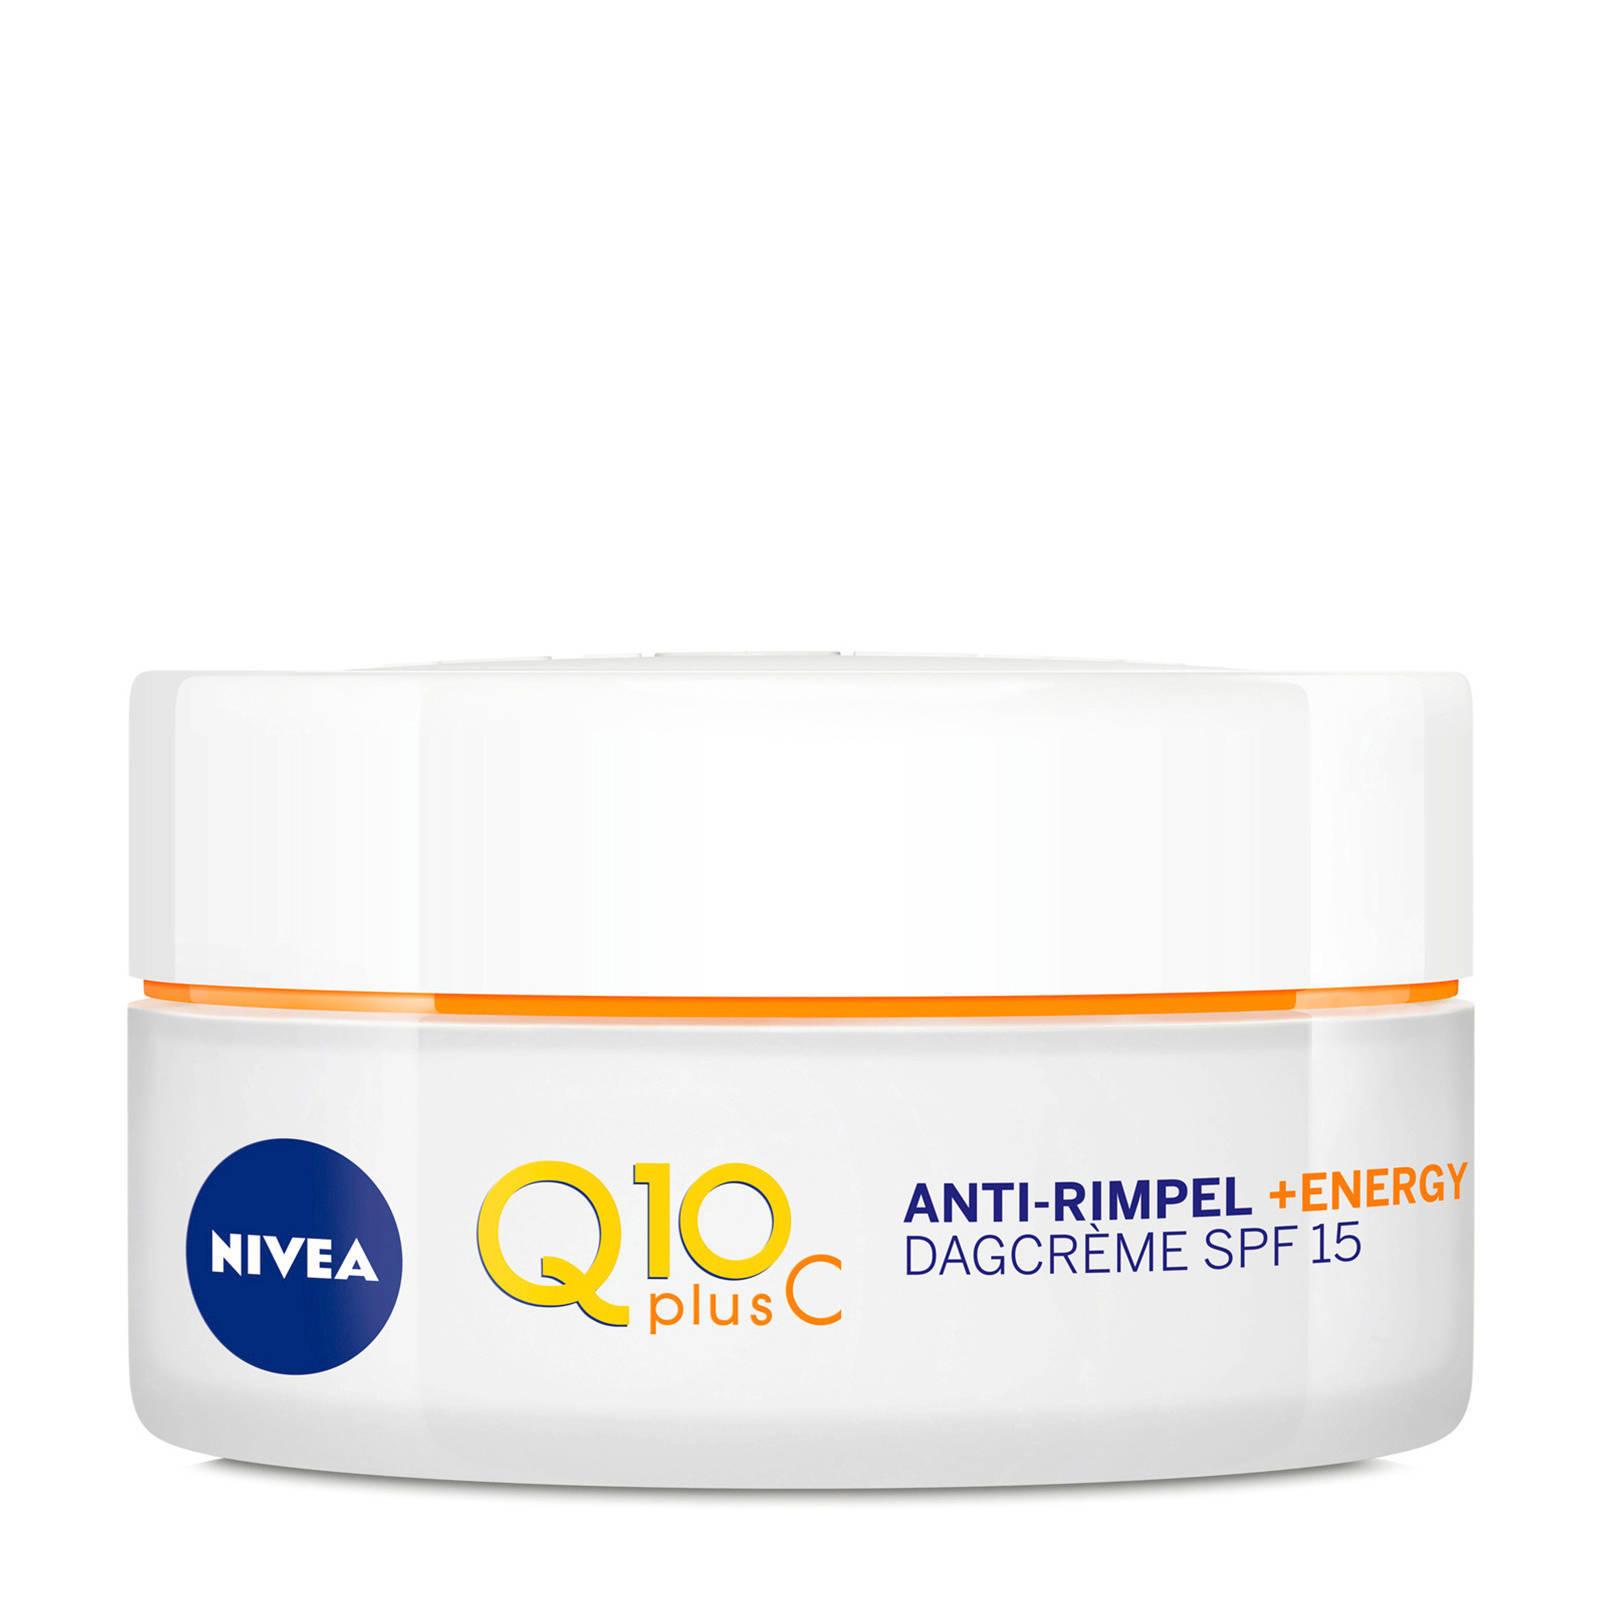 NIVEA Q10plusC Anti-Rimpel +Energy Dagcrème - 50ml